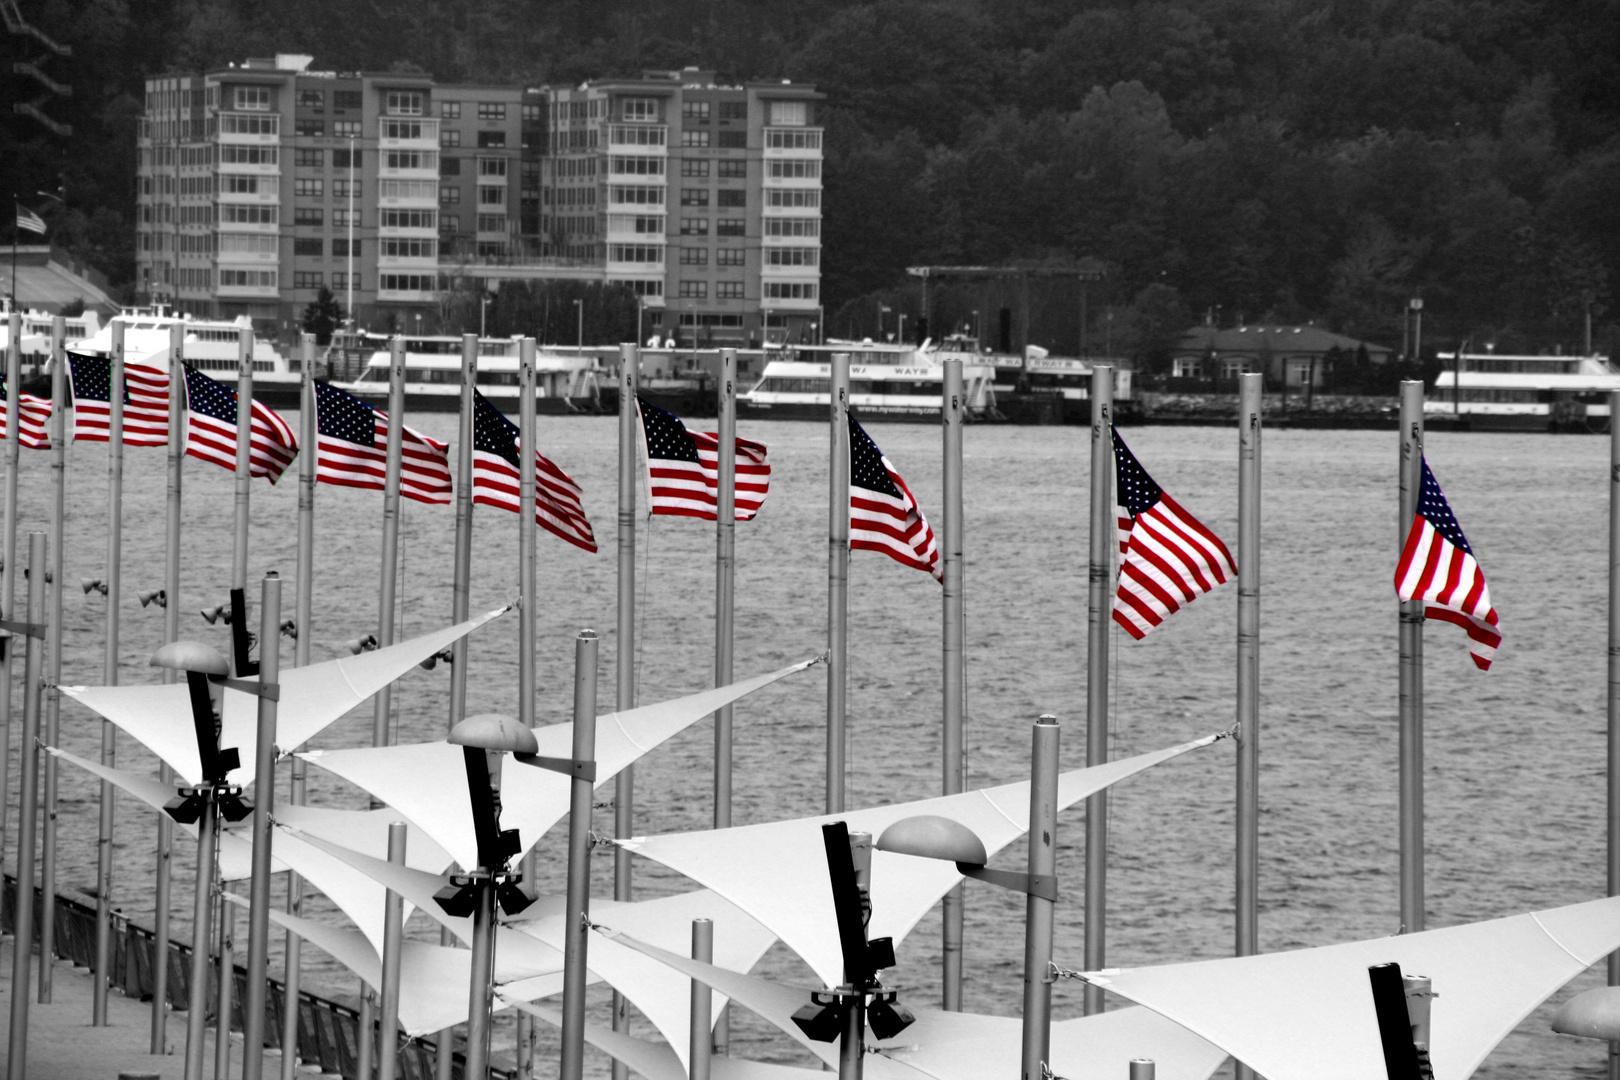 Stars and Stripes - New York 2010